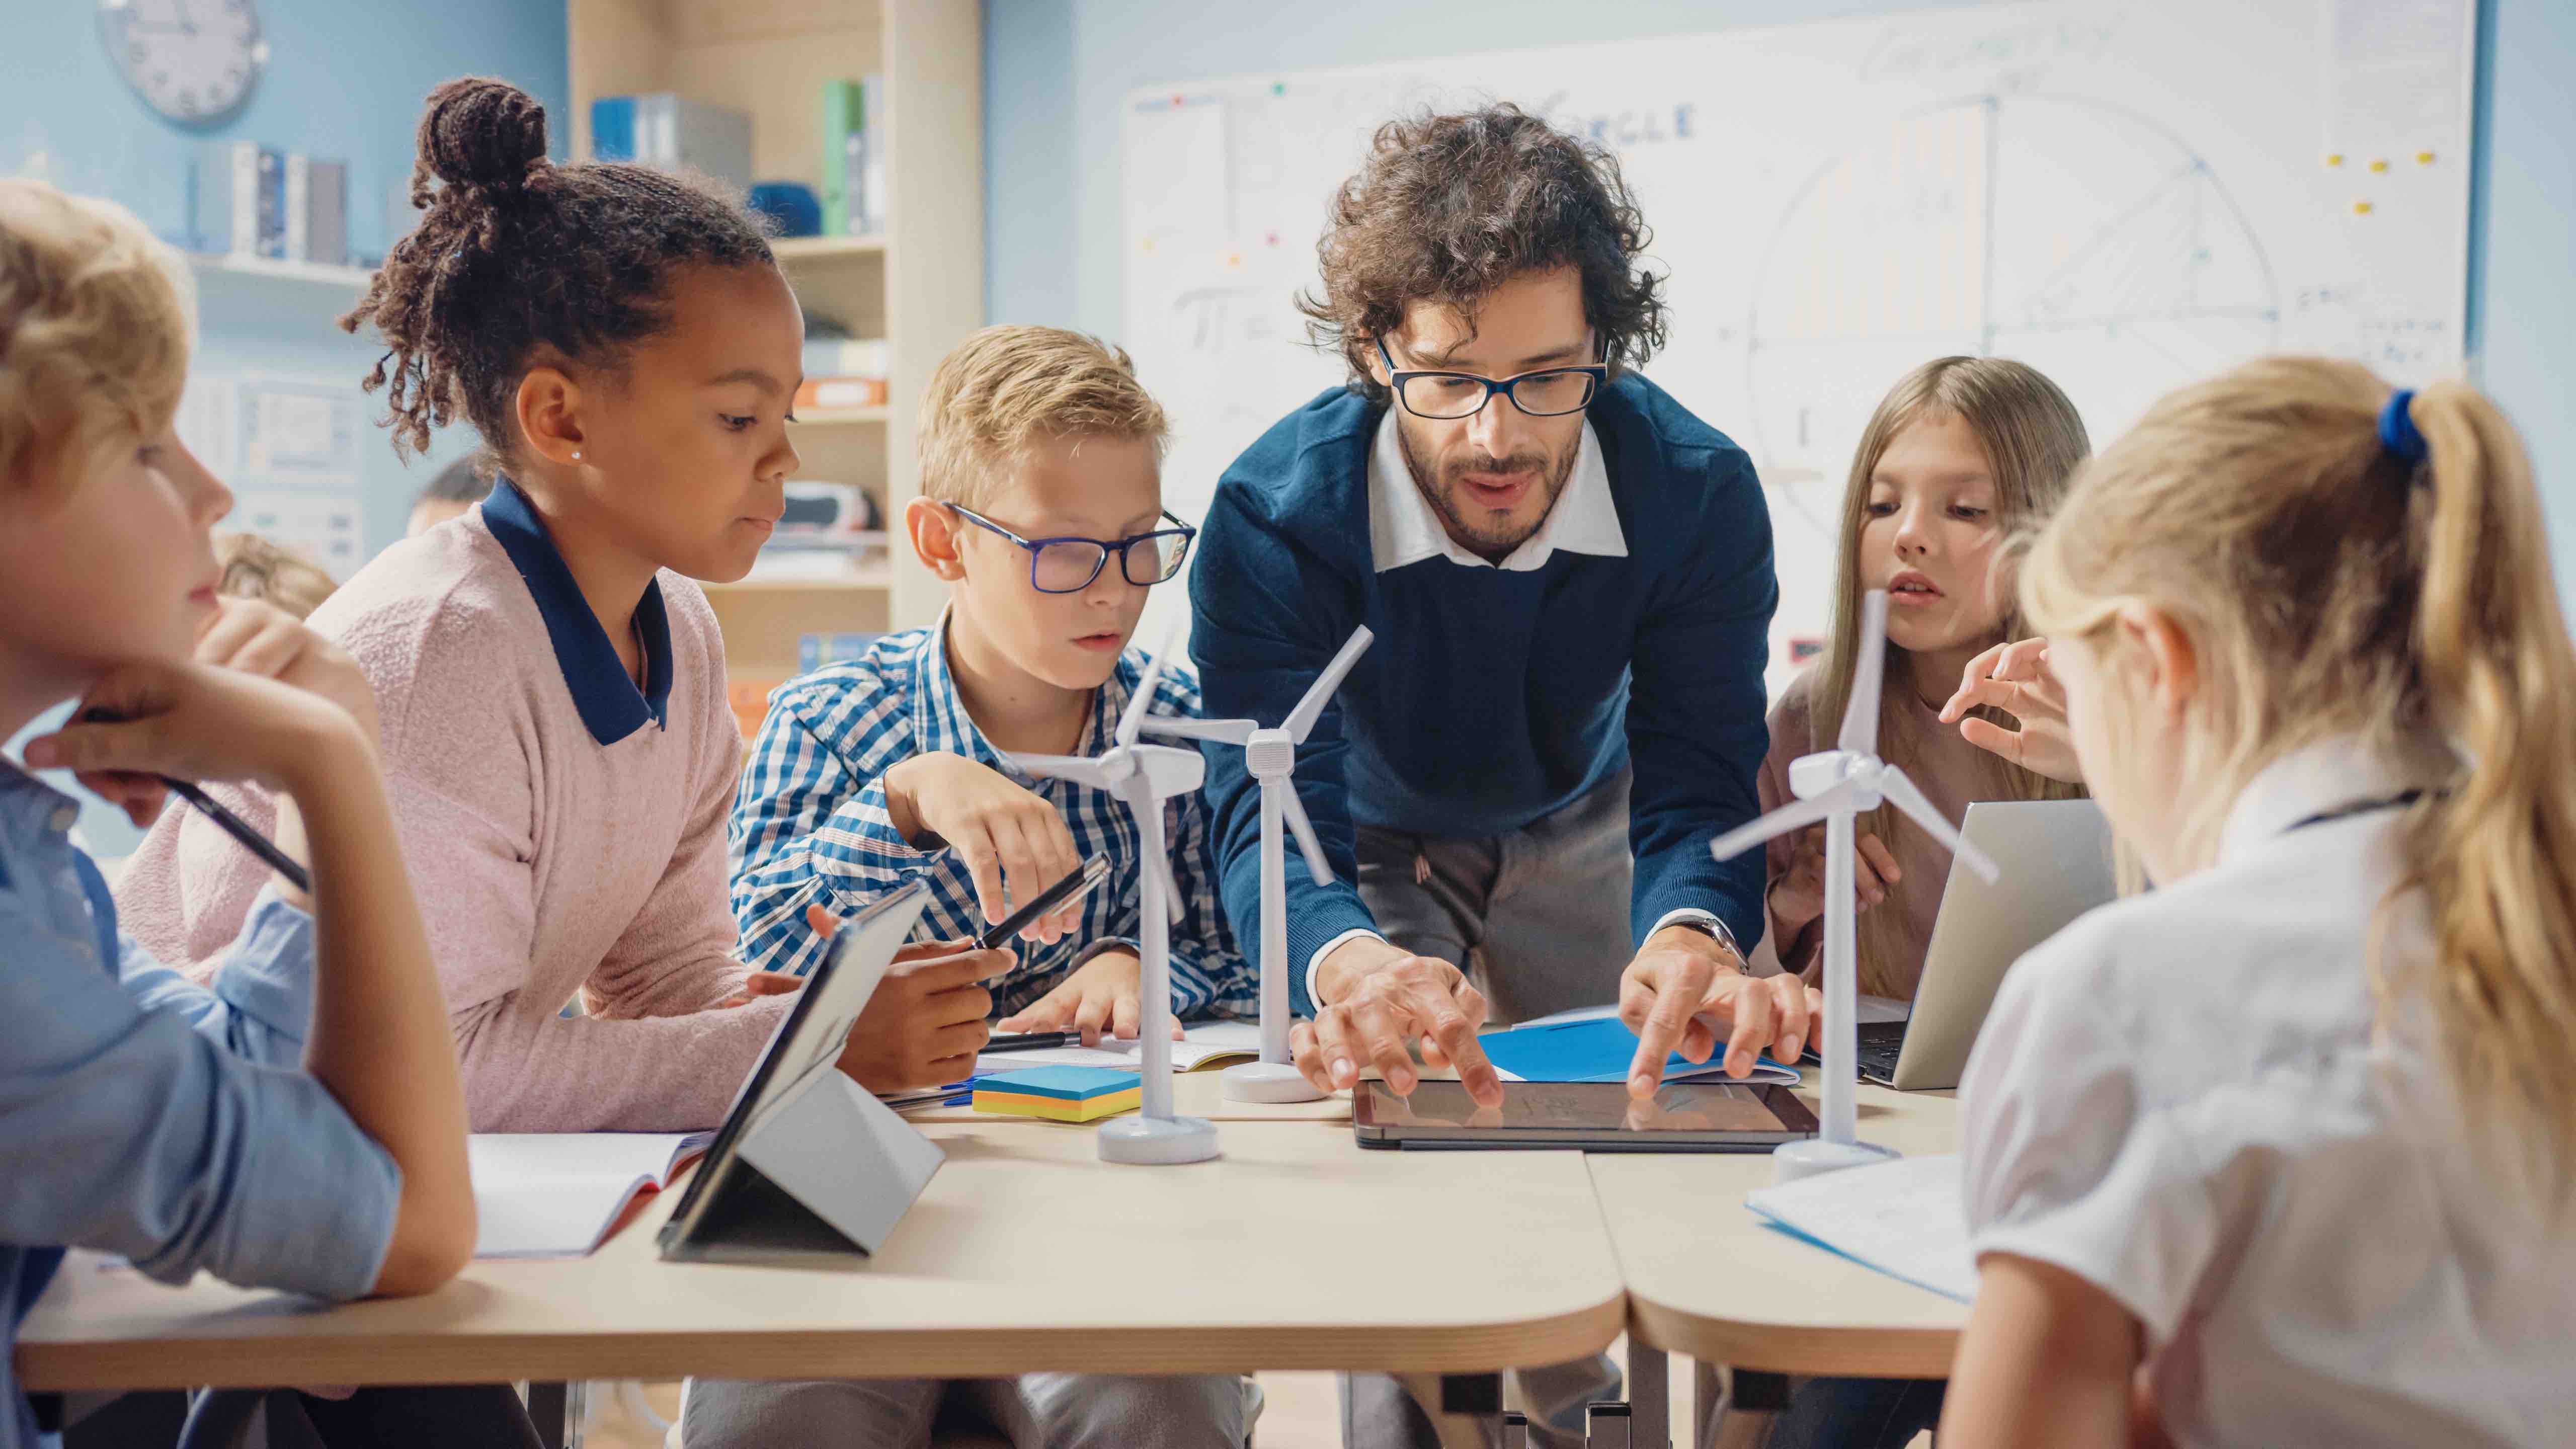 male teacher teaching students